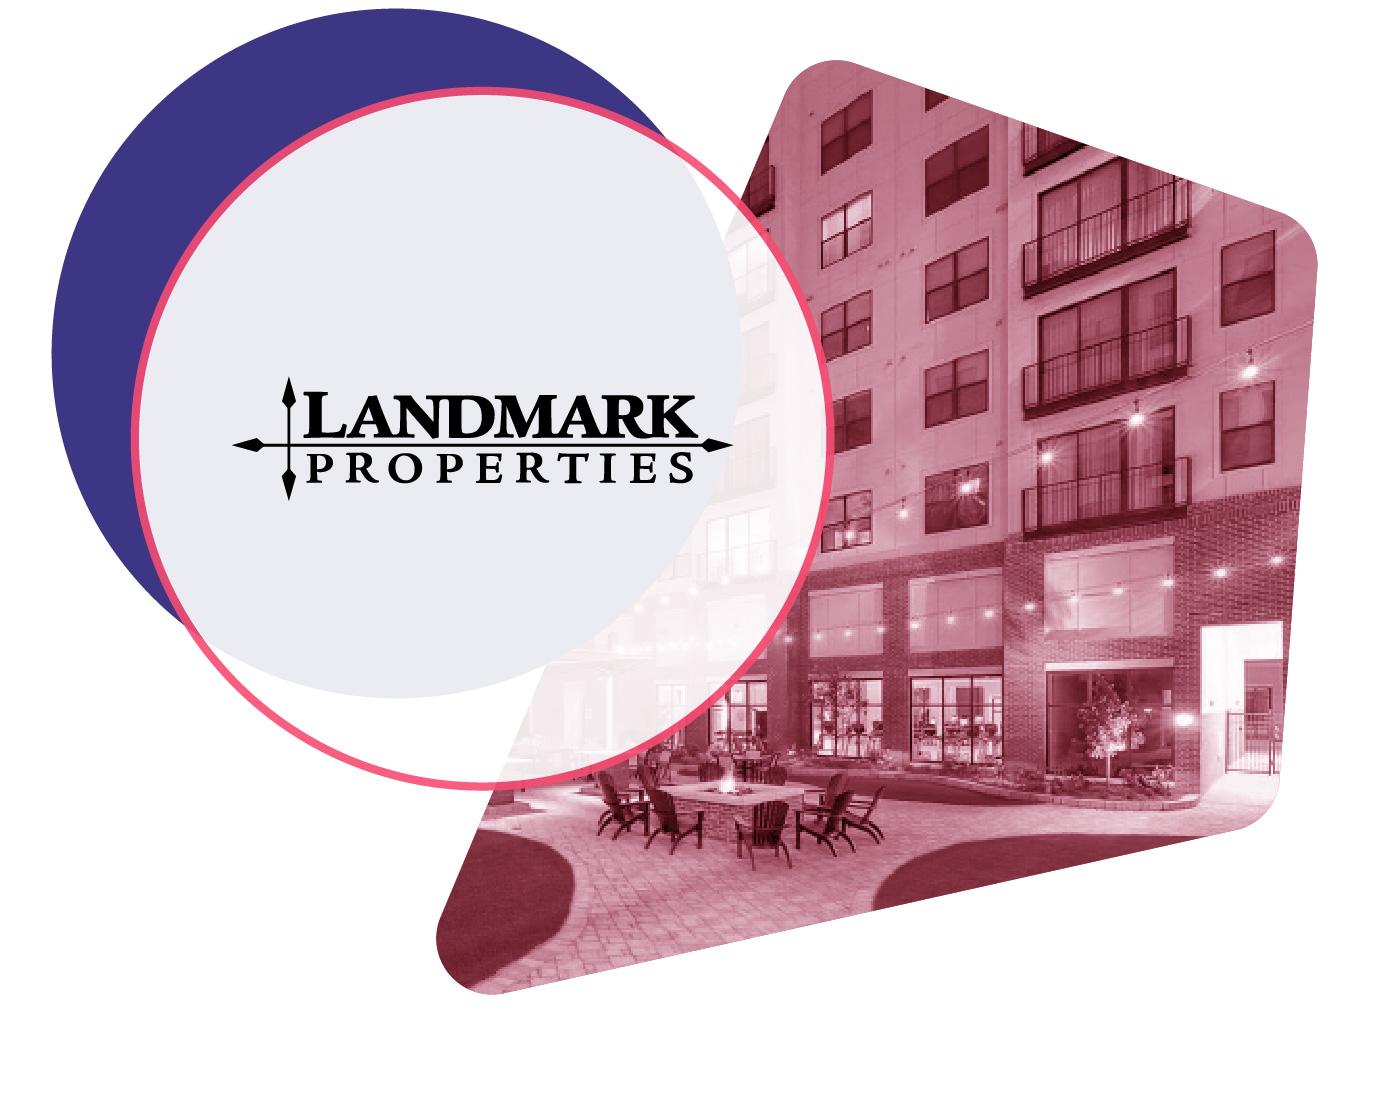 Landmark Properties logo and property image